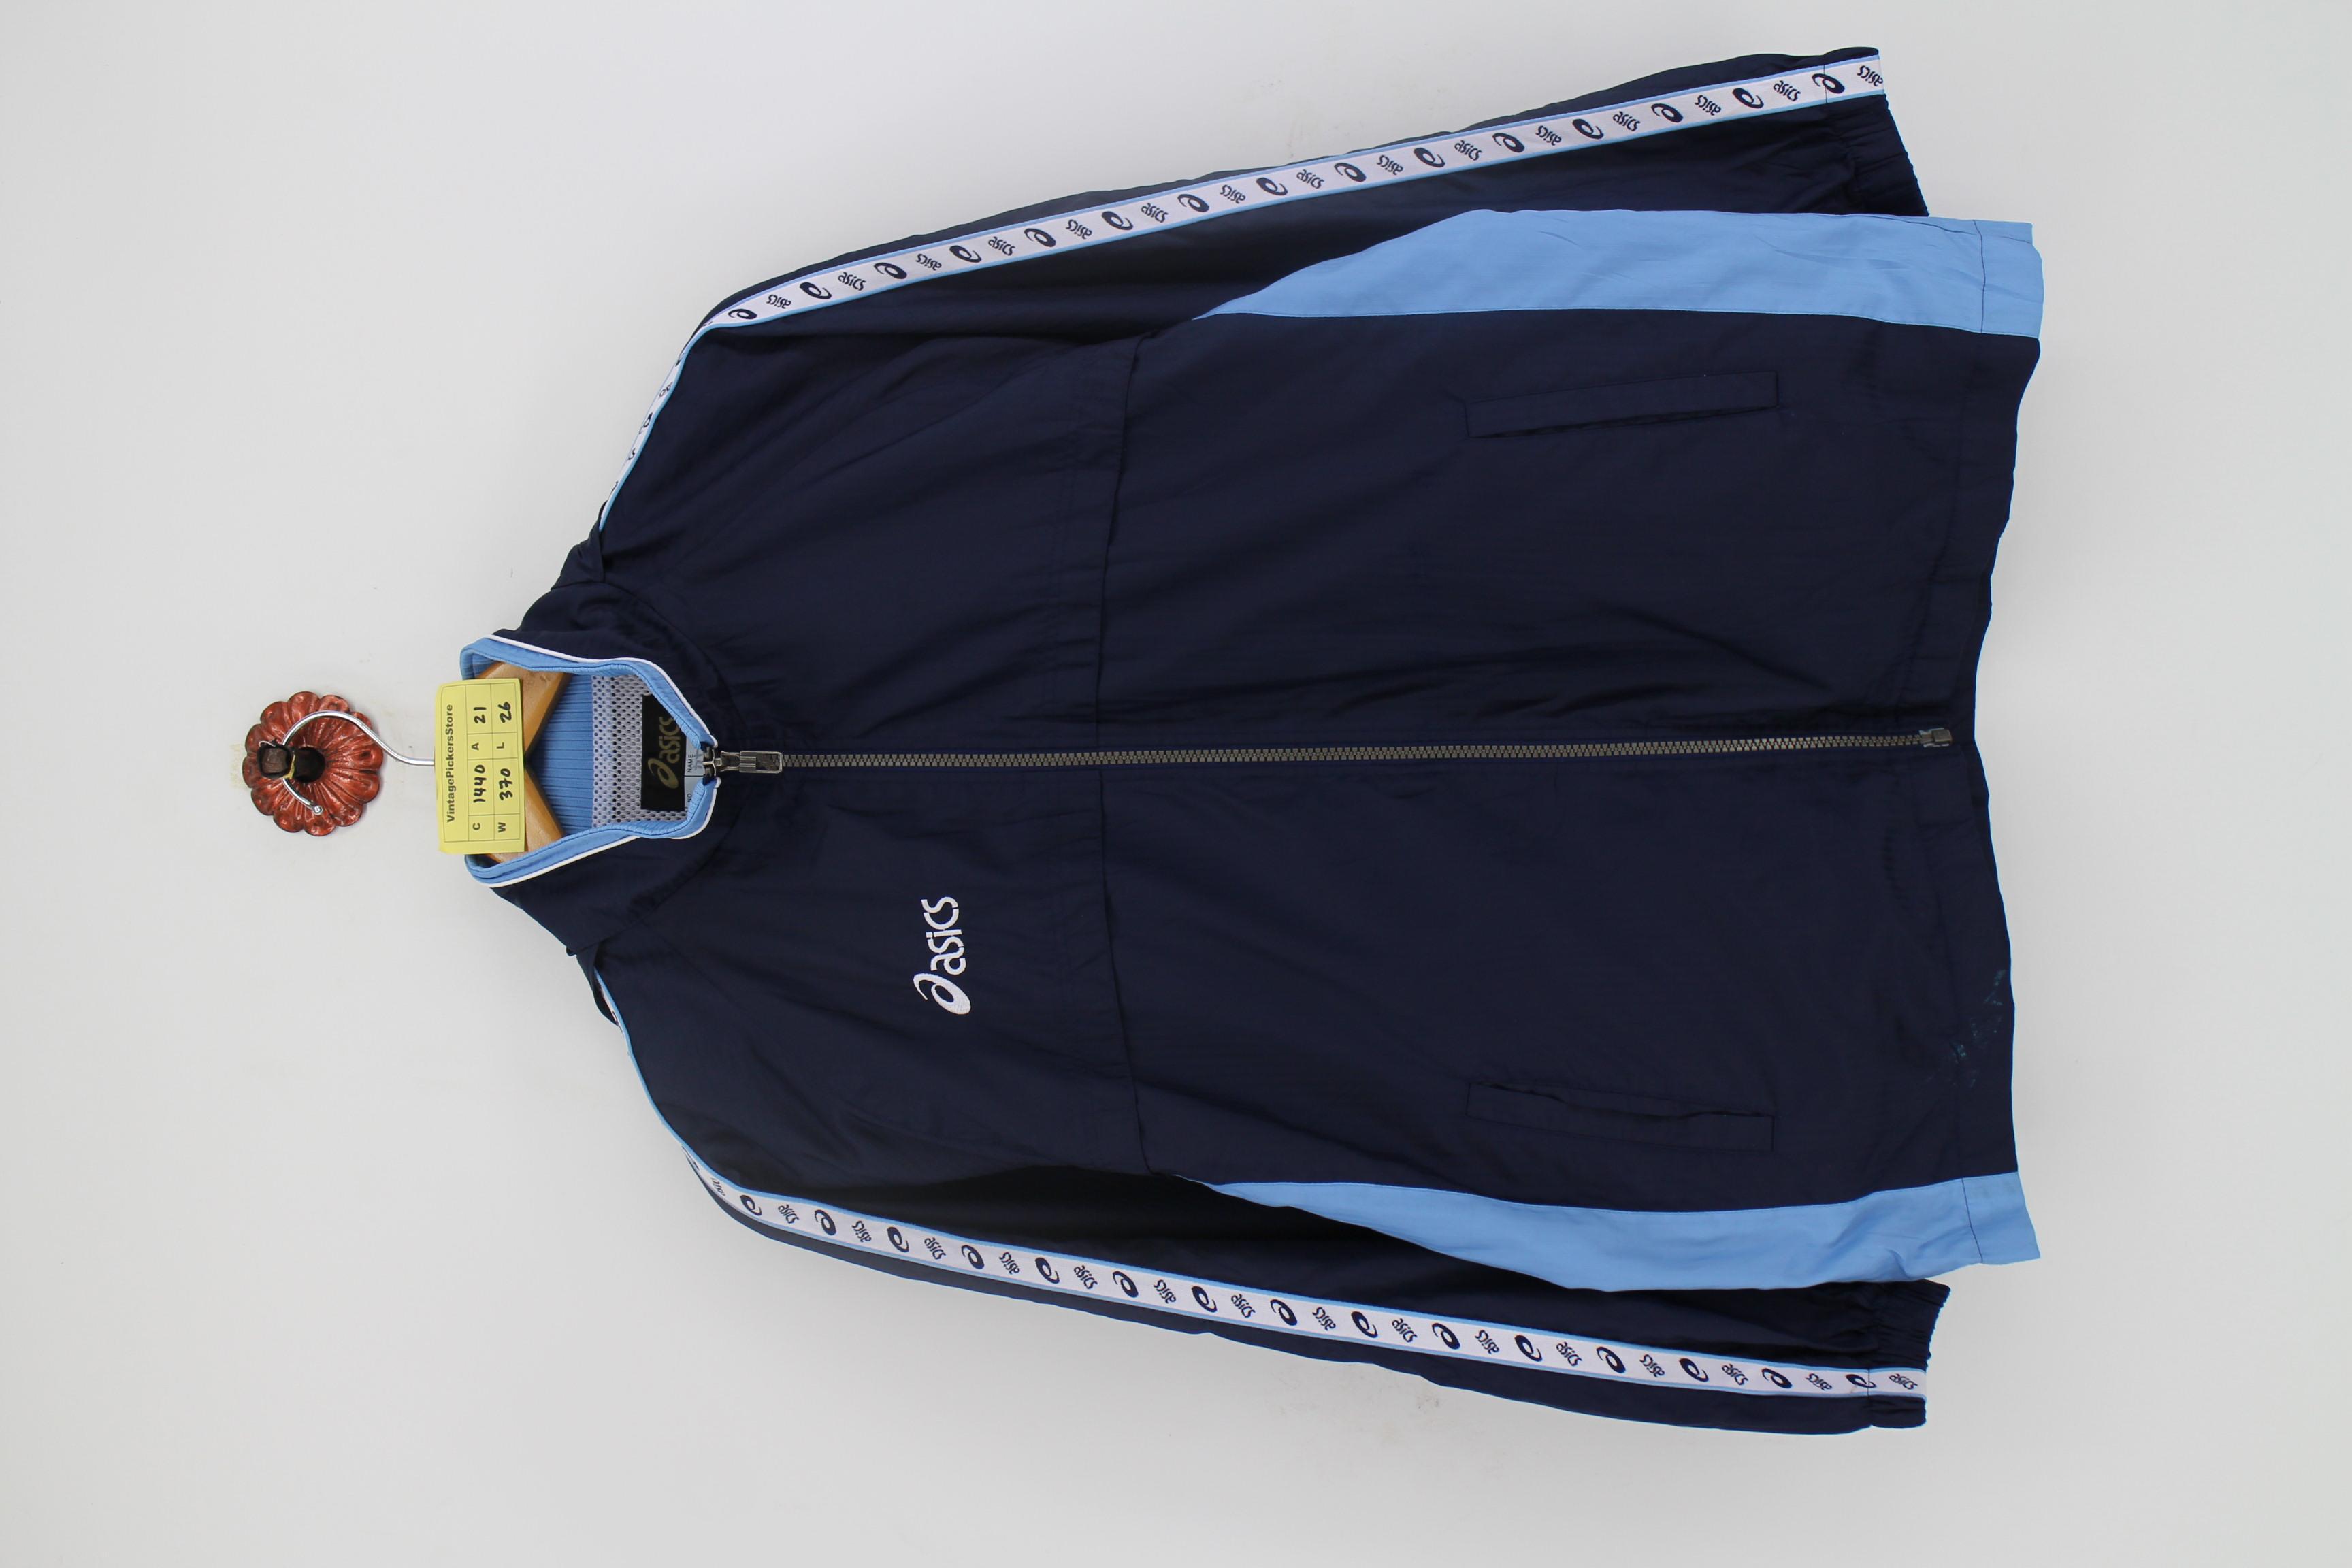 Asics Vintage 90's ASICS Japan Windbreaker Jacket Unisex Size M